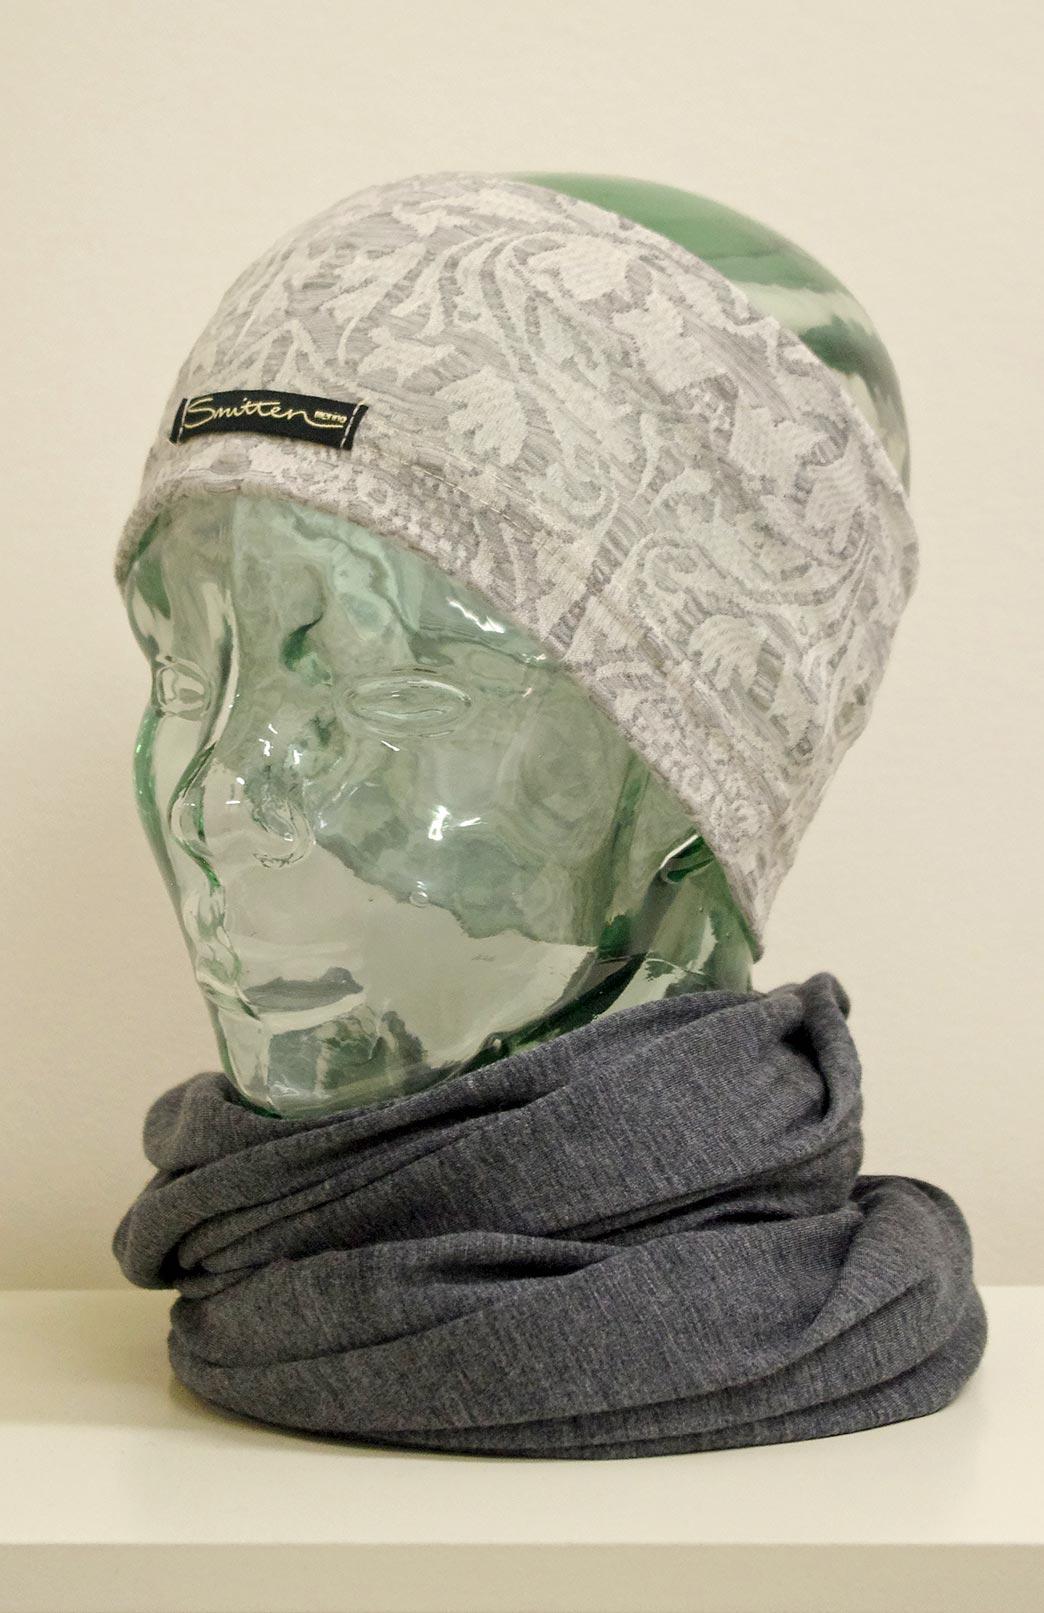 Headband / Ear Warmer - Unisex Soft Grey and White Floral Merino Wool Headband and Ear Warmer - Smitten Merino Tasmania Australia